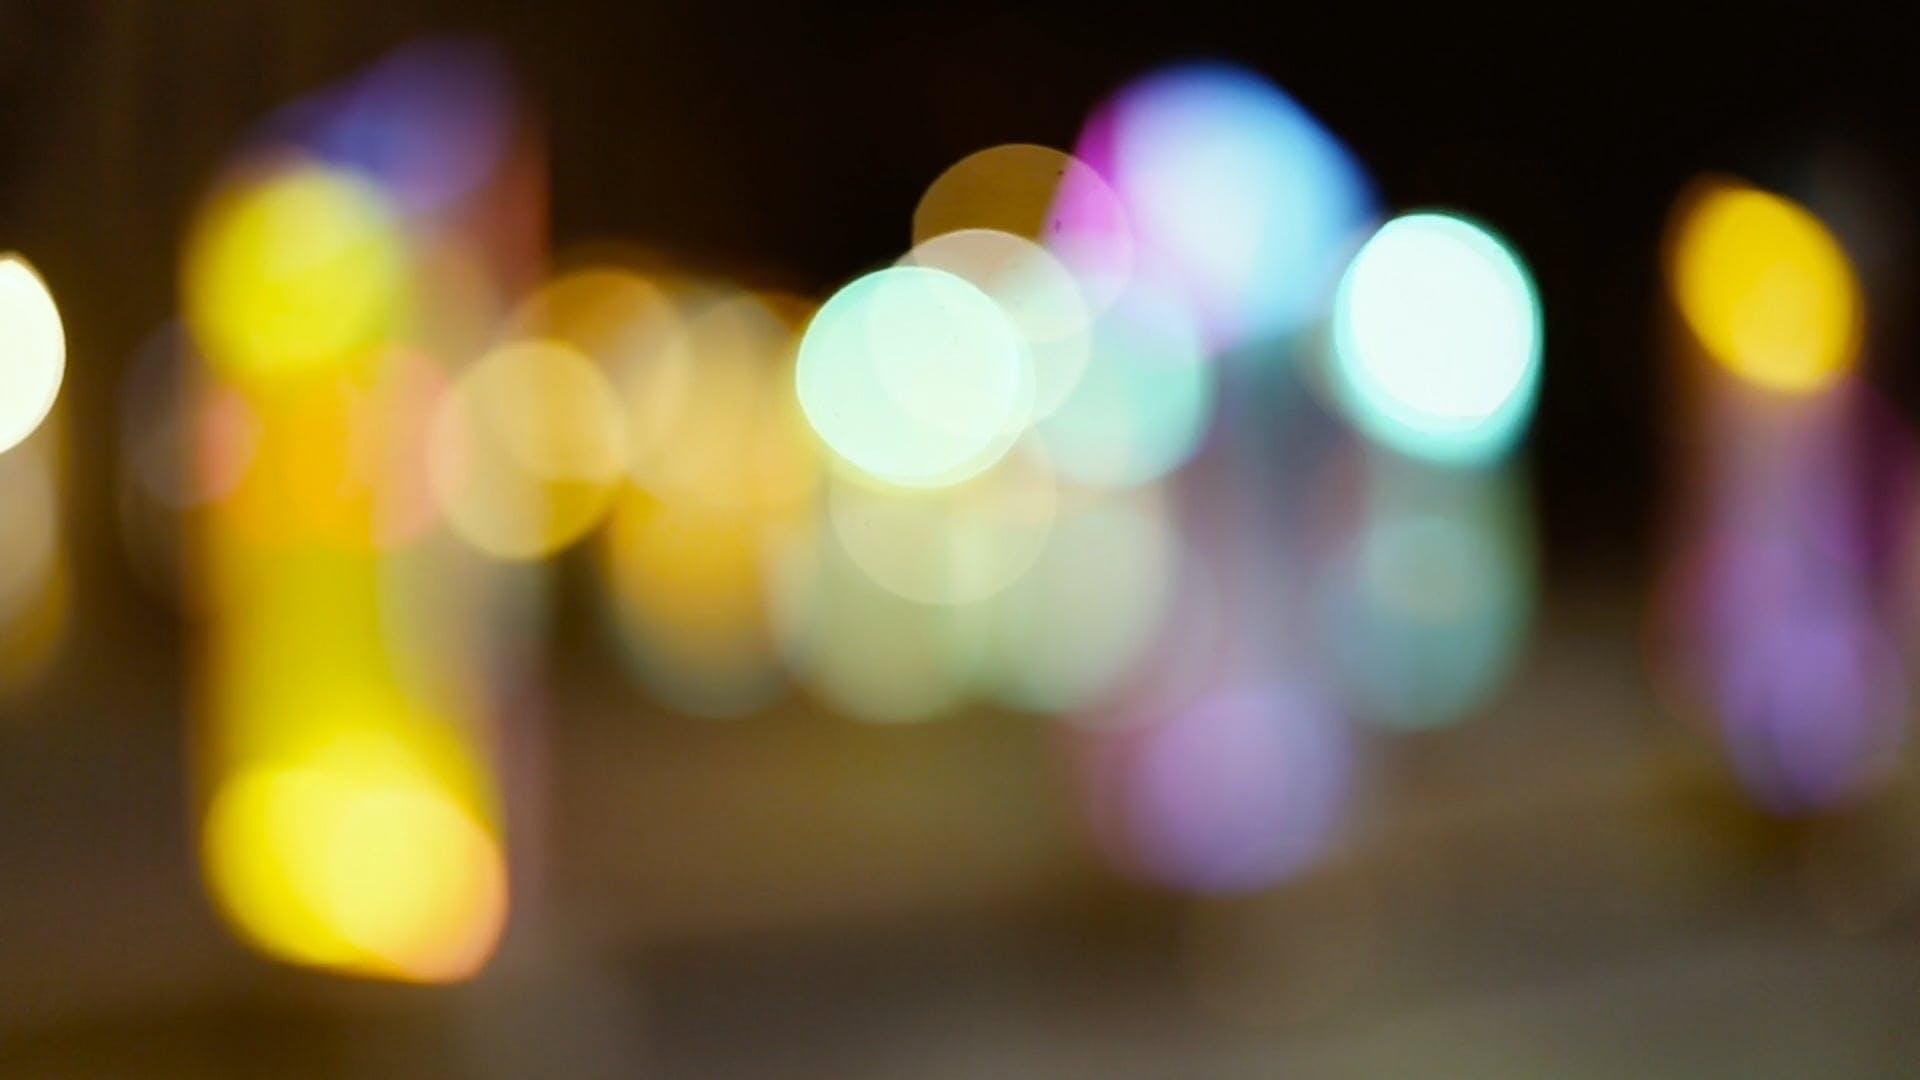 Blur Colorful Lights